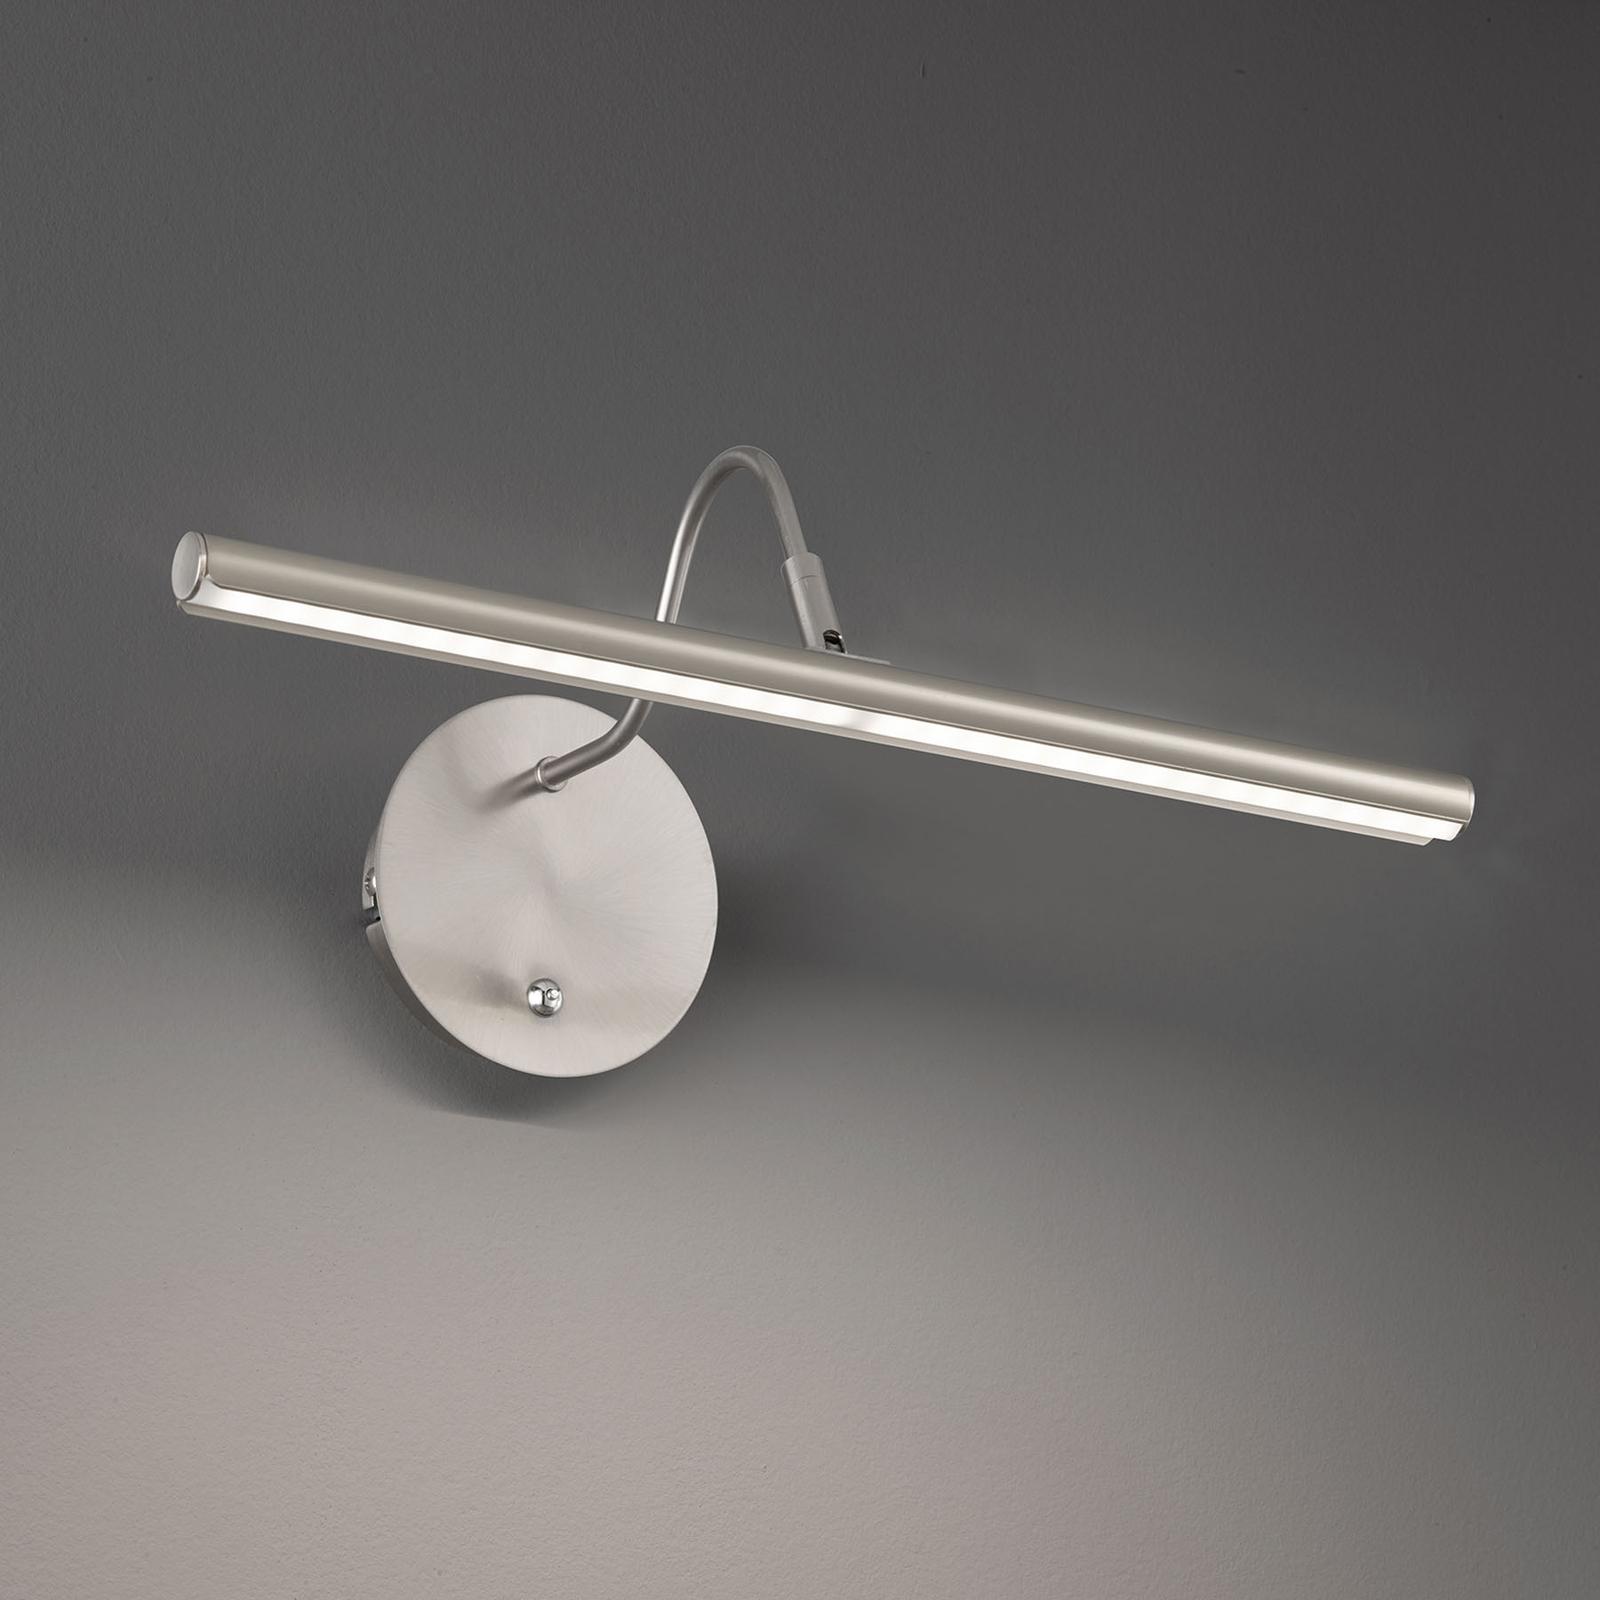 Applique LED Nami con interruttore, color nichel